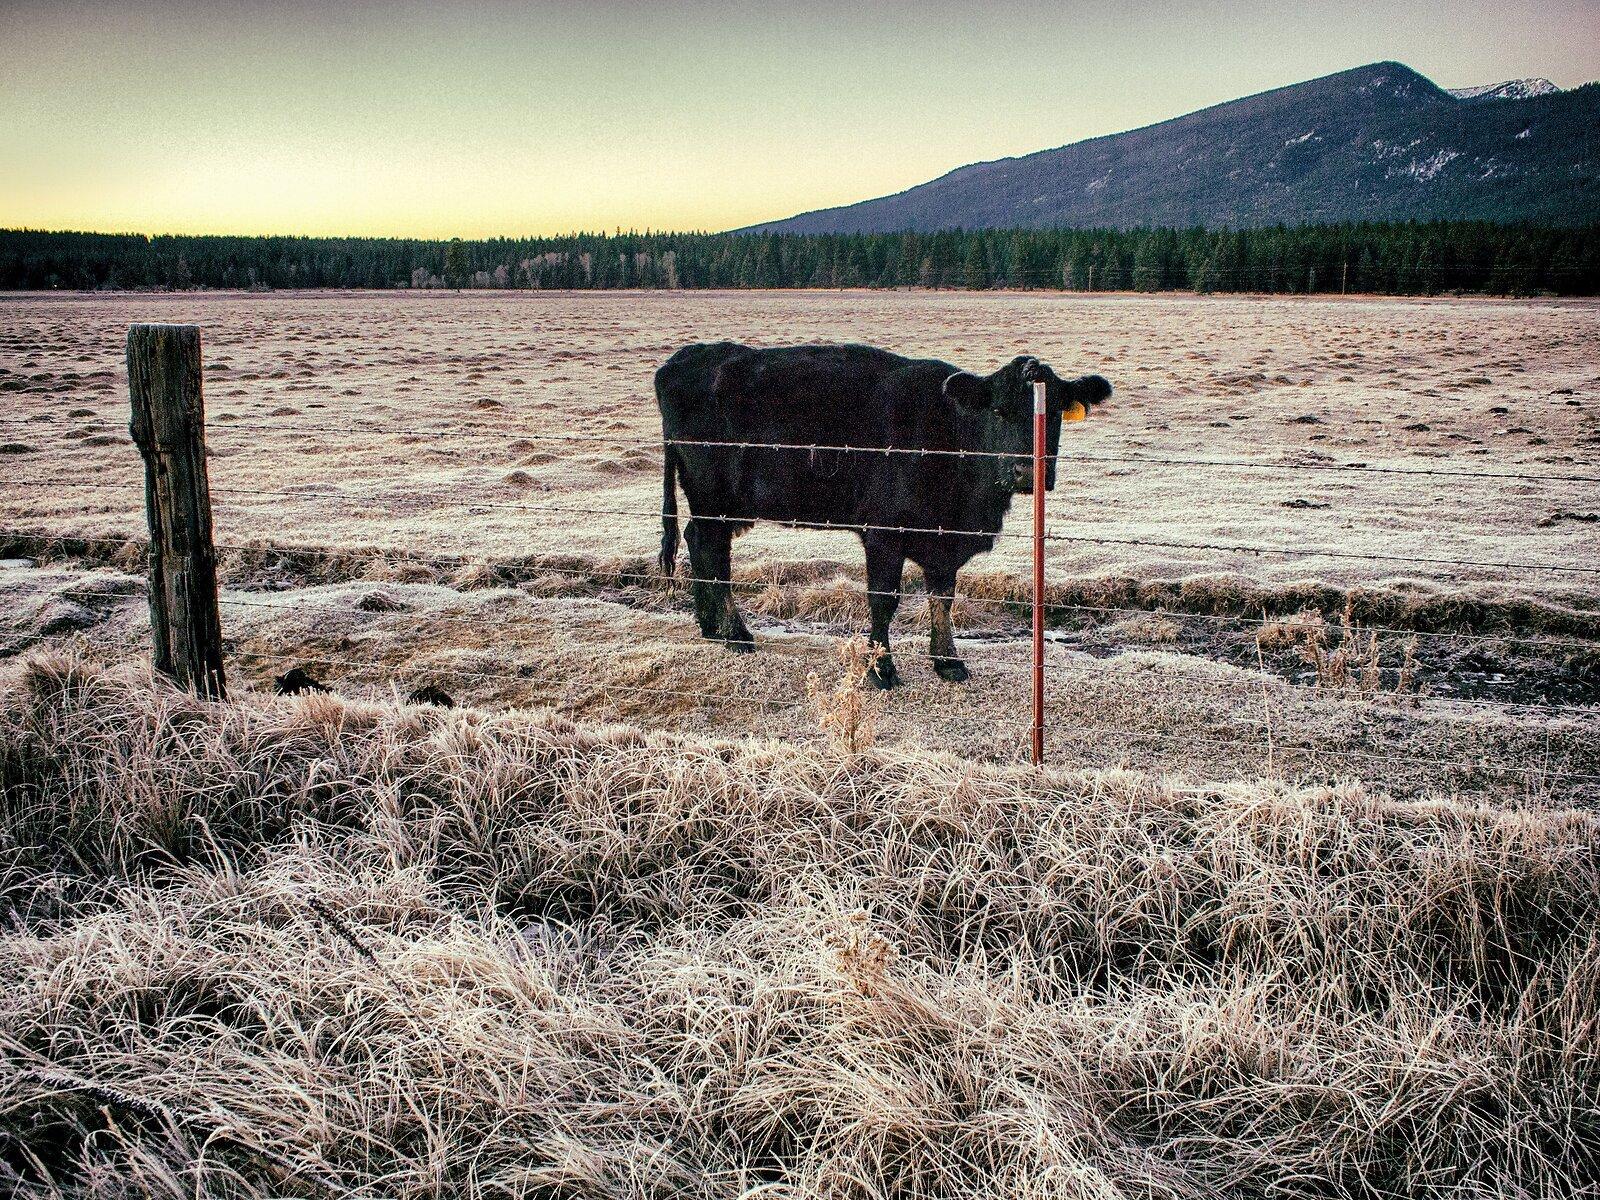 EP3_Nov28_Klamath_Cow.jpg